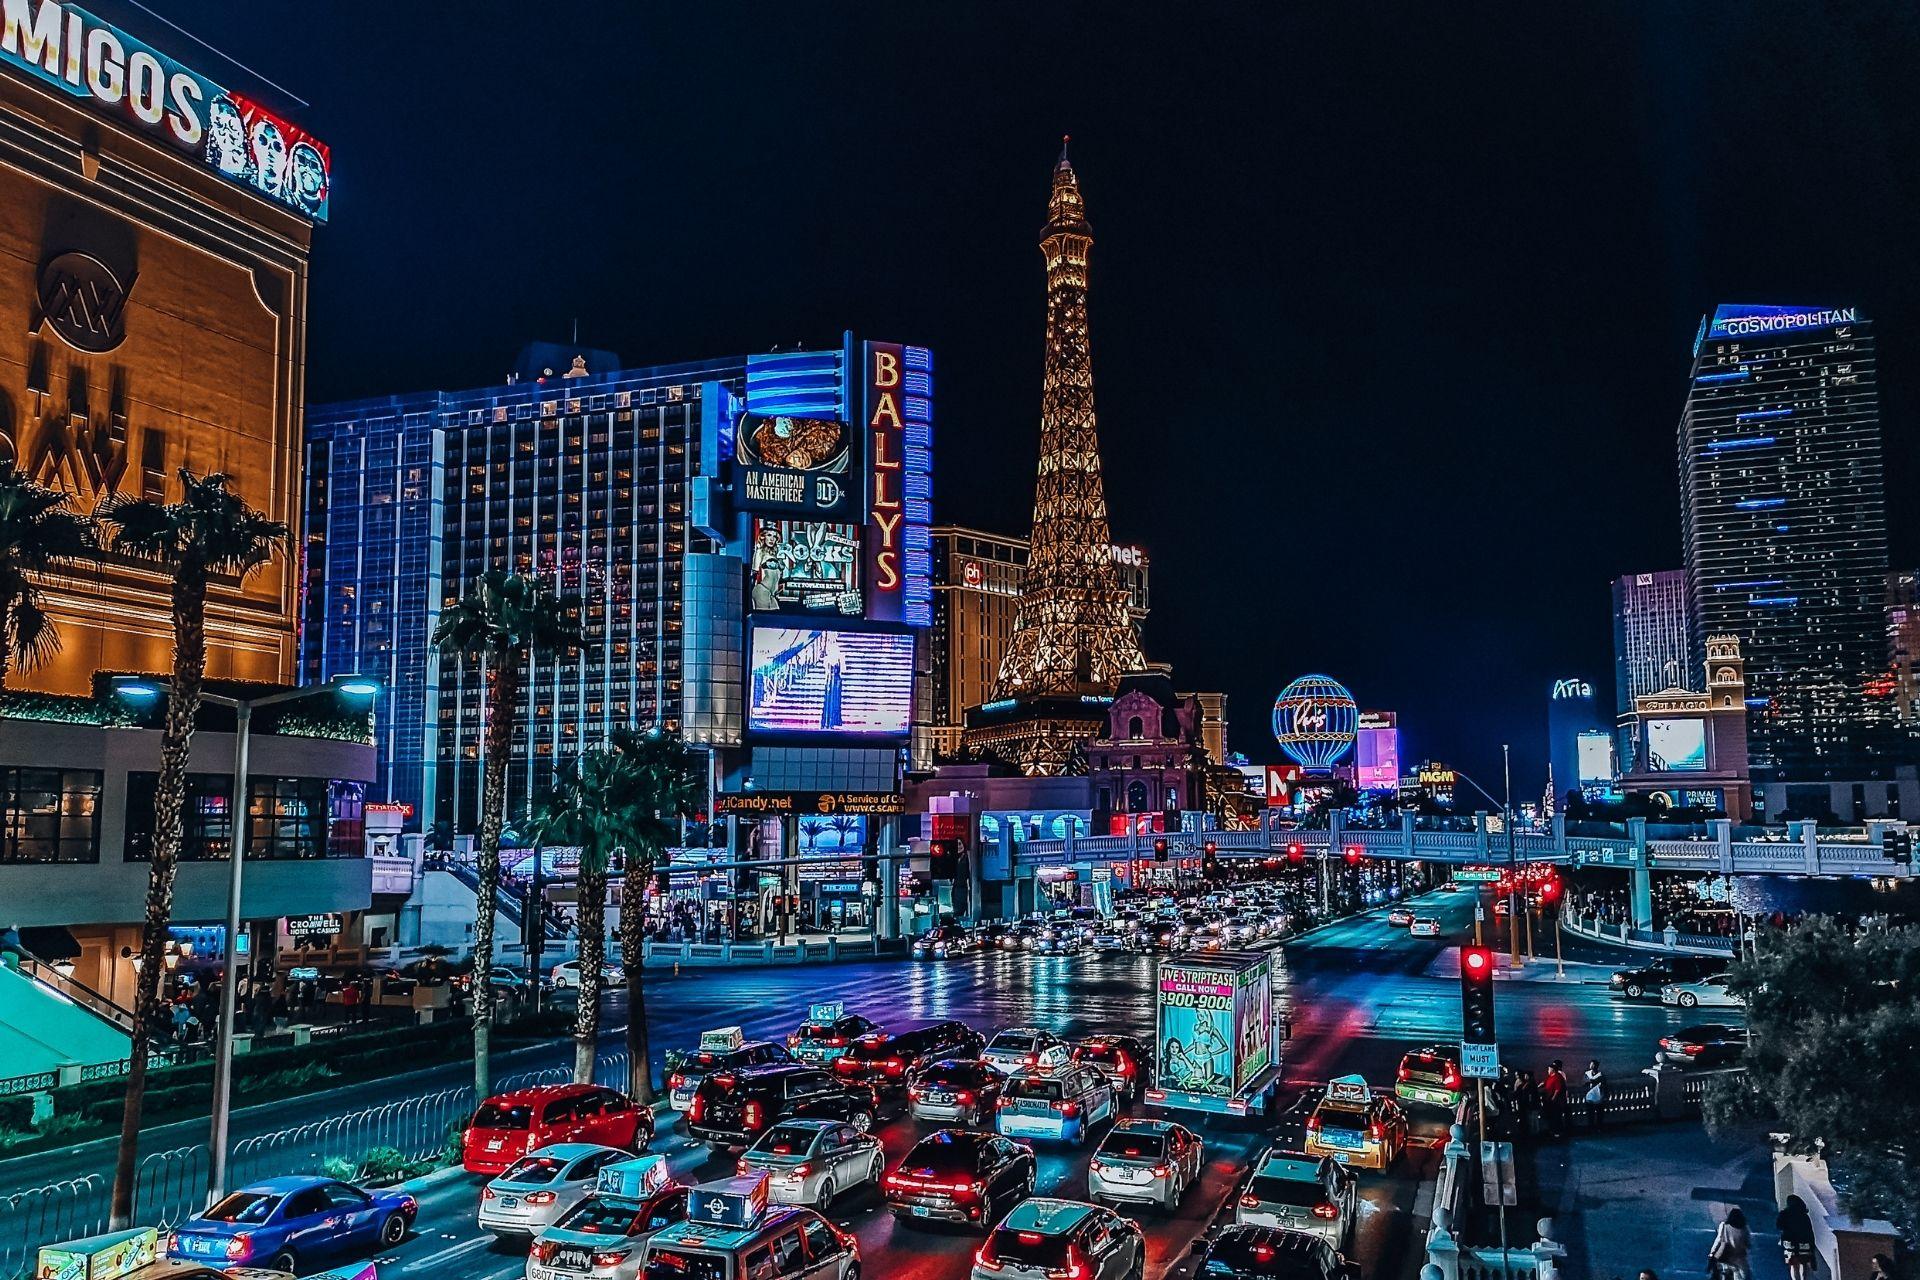 A city view of Las Vegas at night